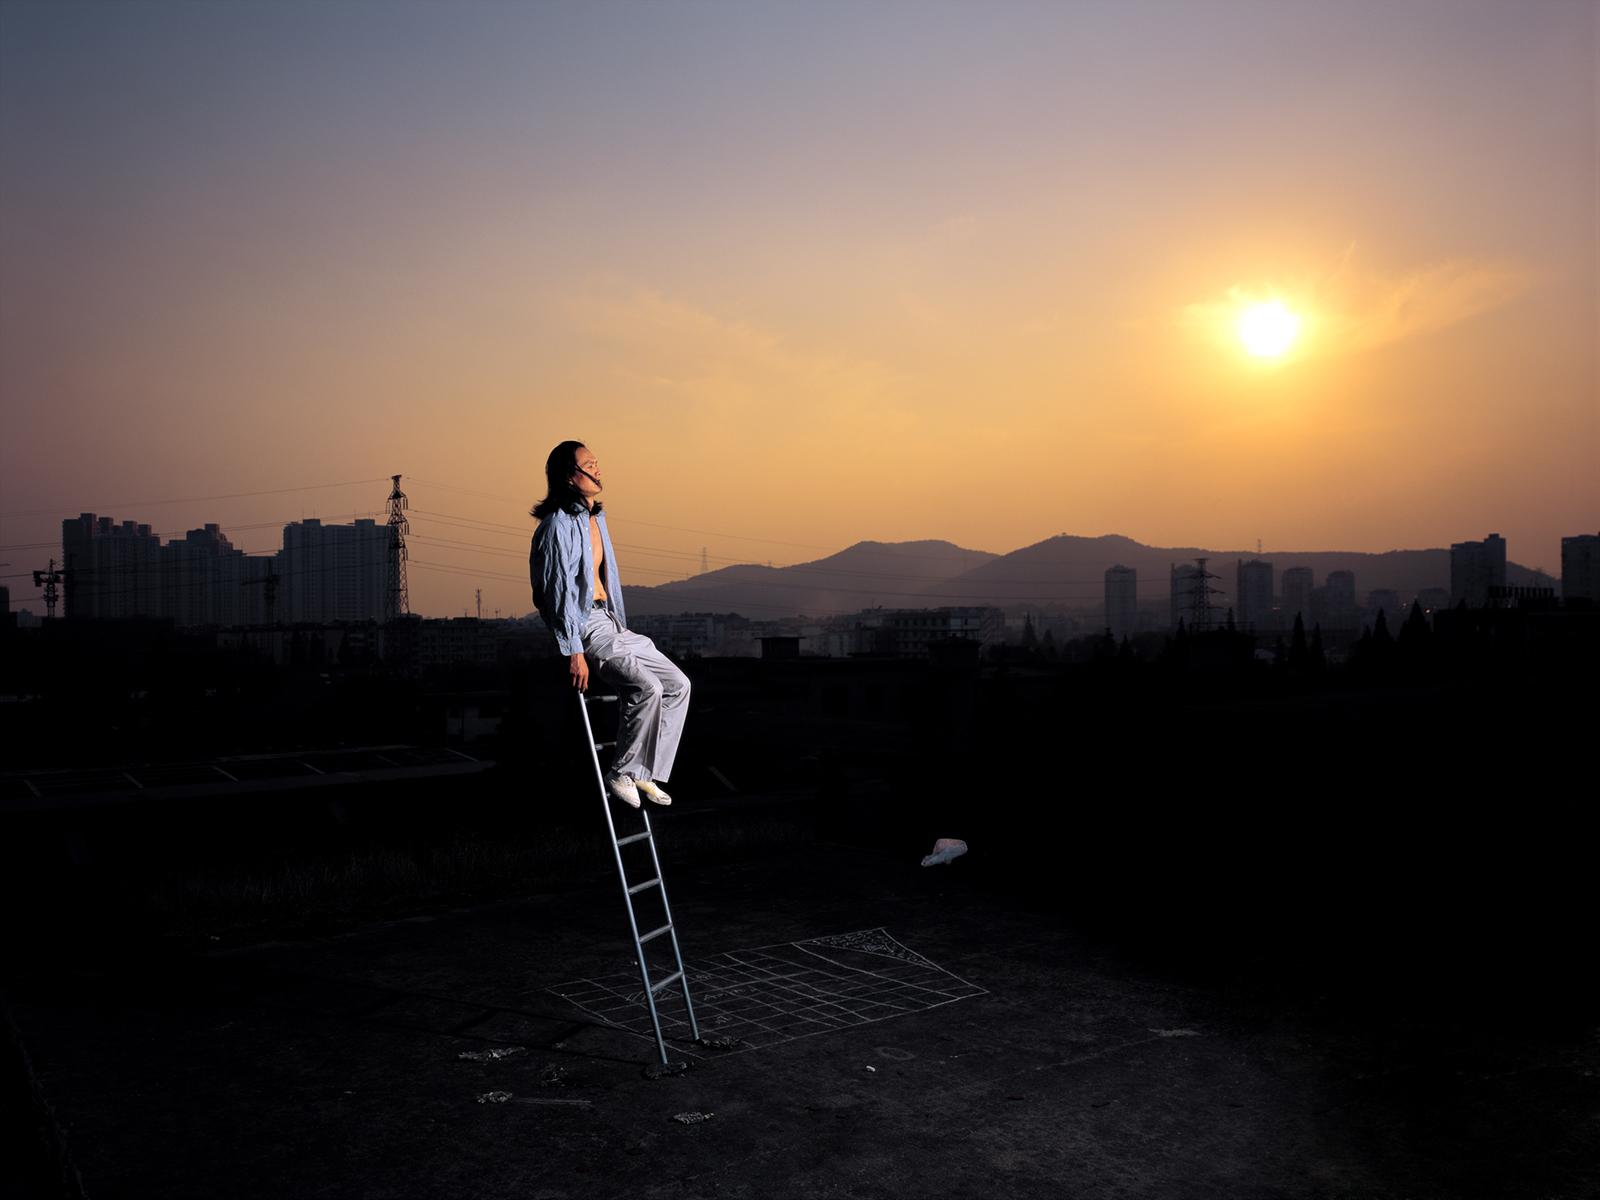 Chen Wei 陈维, A Kind Of Mensuration, 2007, Archival inkjet print 收藏级艺术微喷, 120 x 160 cm